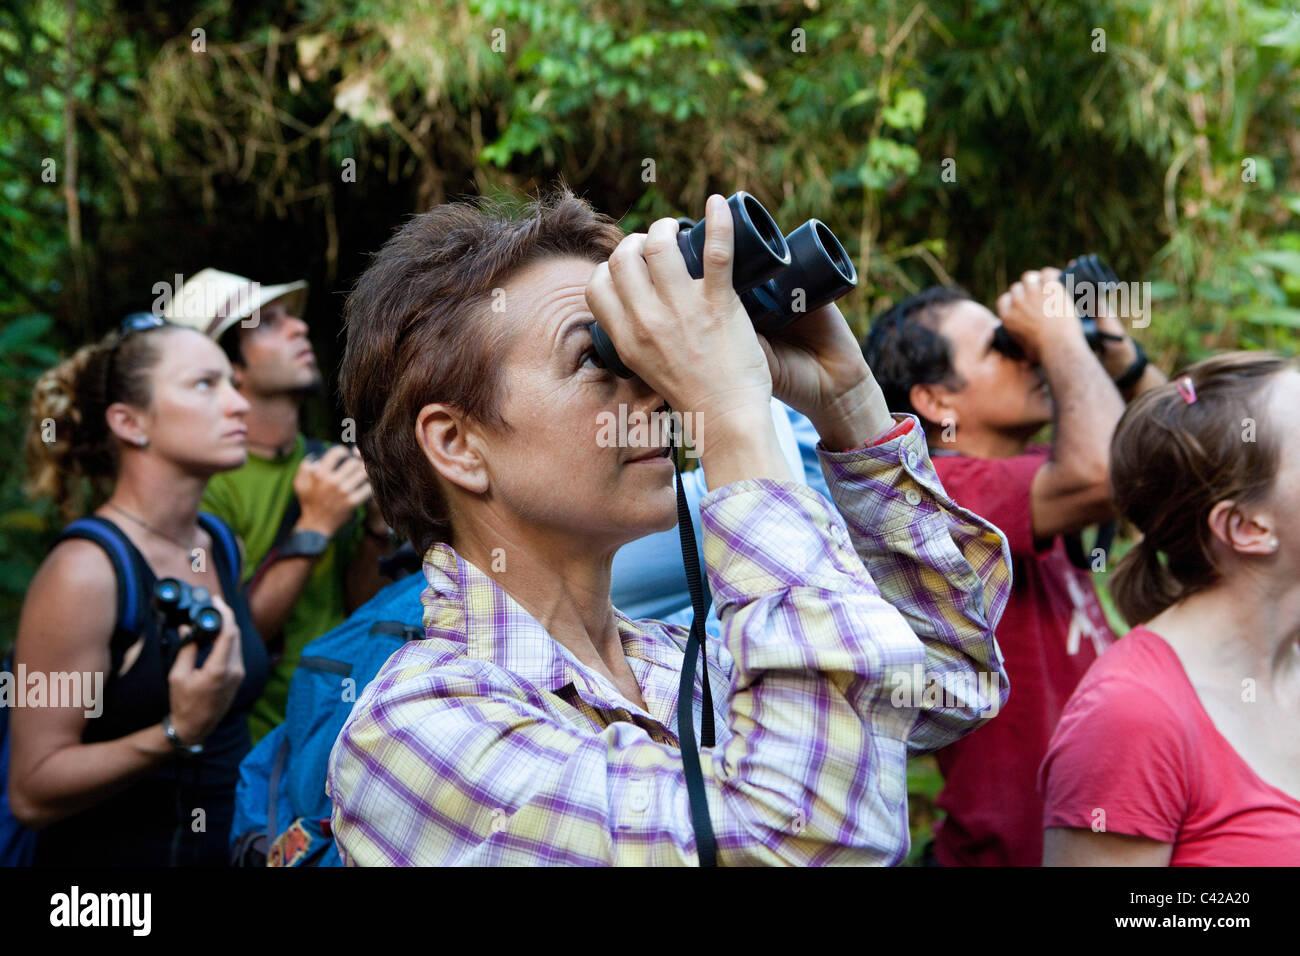 Peru, Cruz de Mayo, Manu National Park, UNESCO World Heritage Site, Pantiacolla mountains. Tourists hiking in forest. - Stock Image